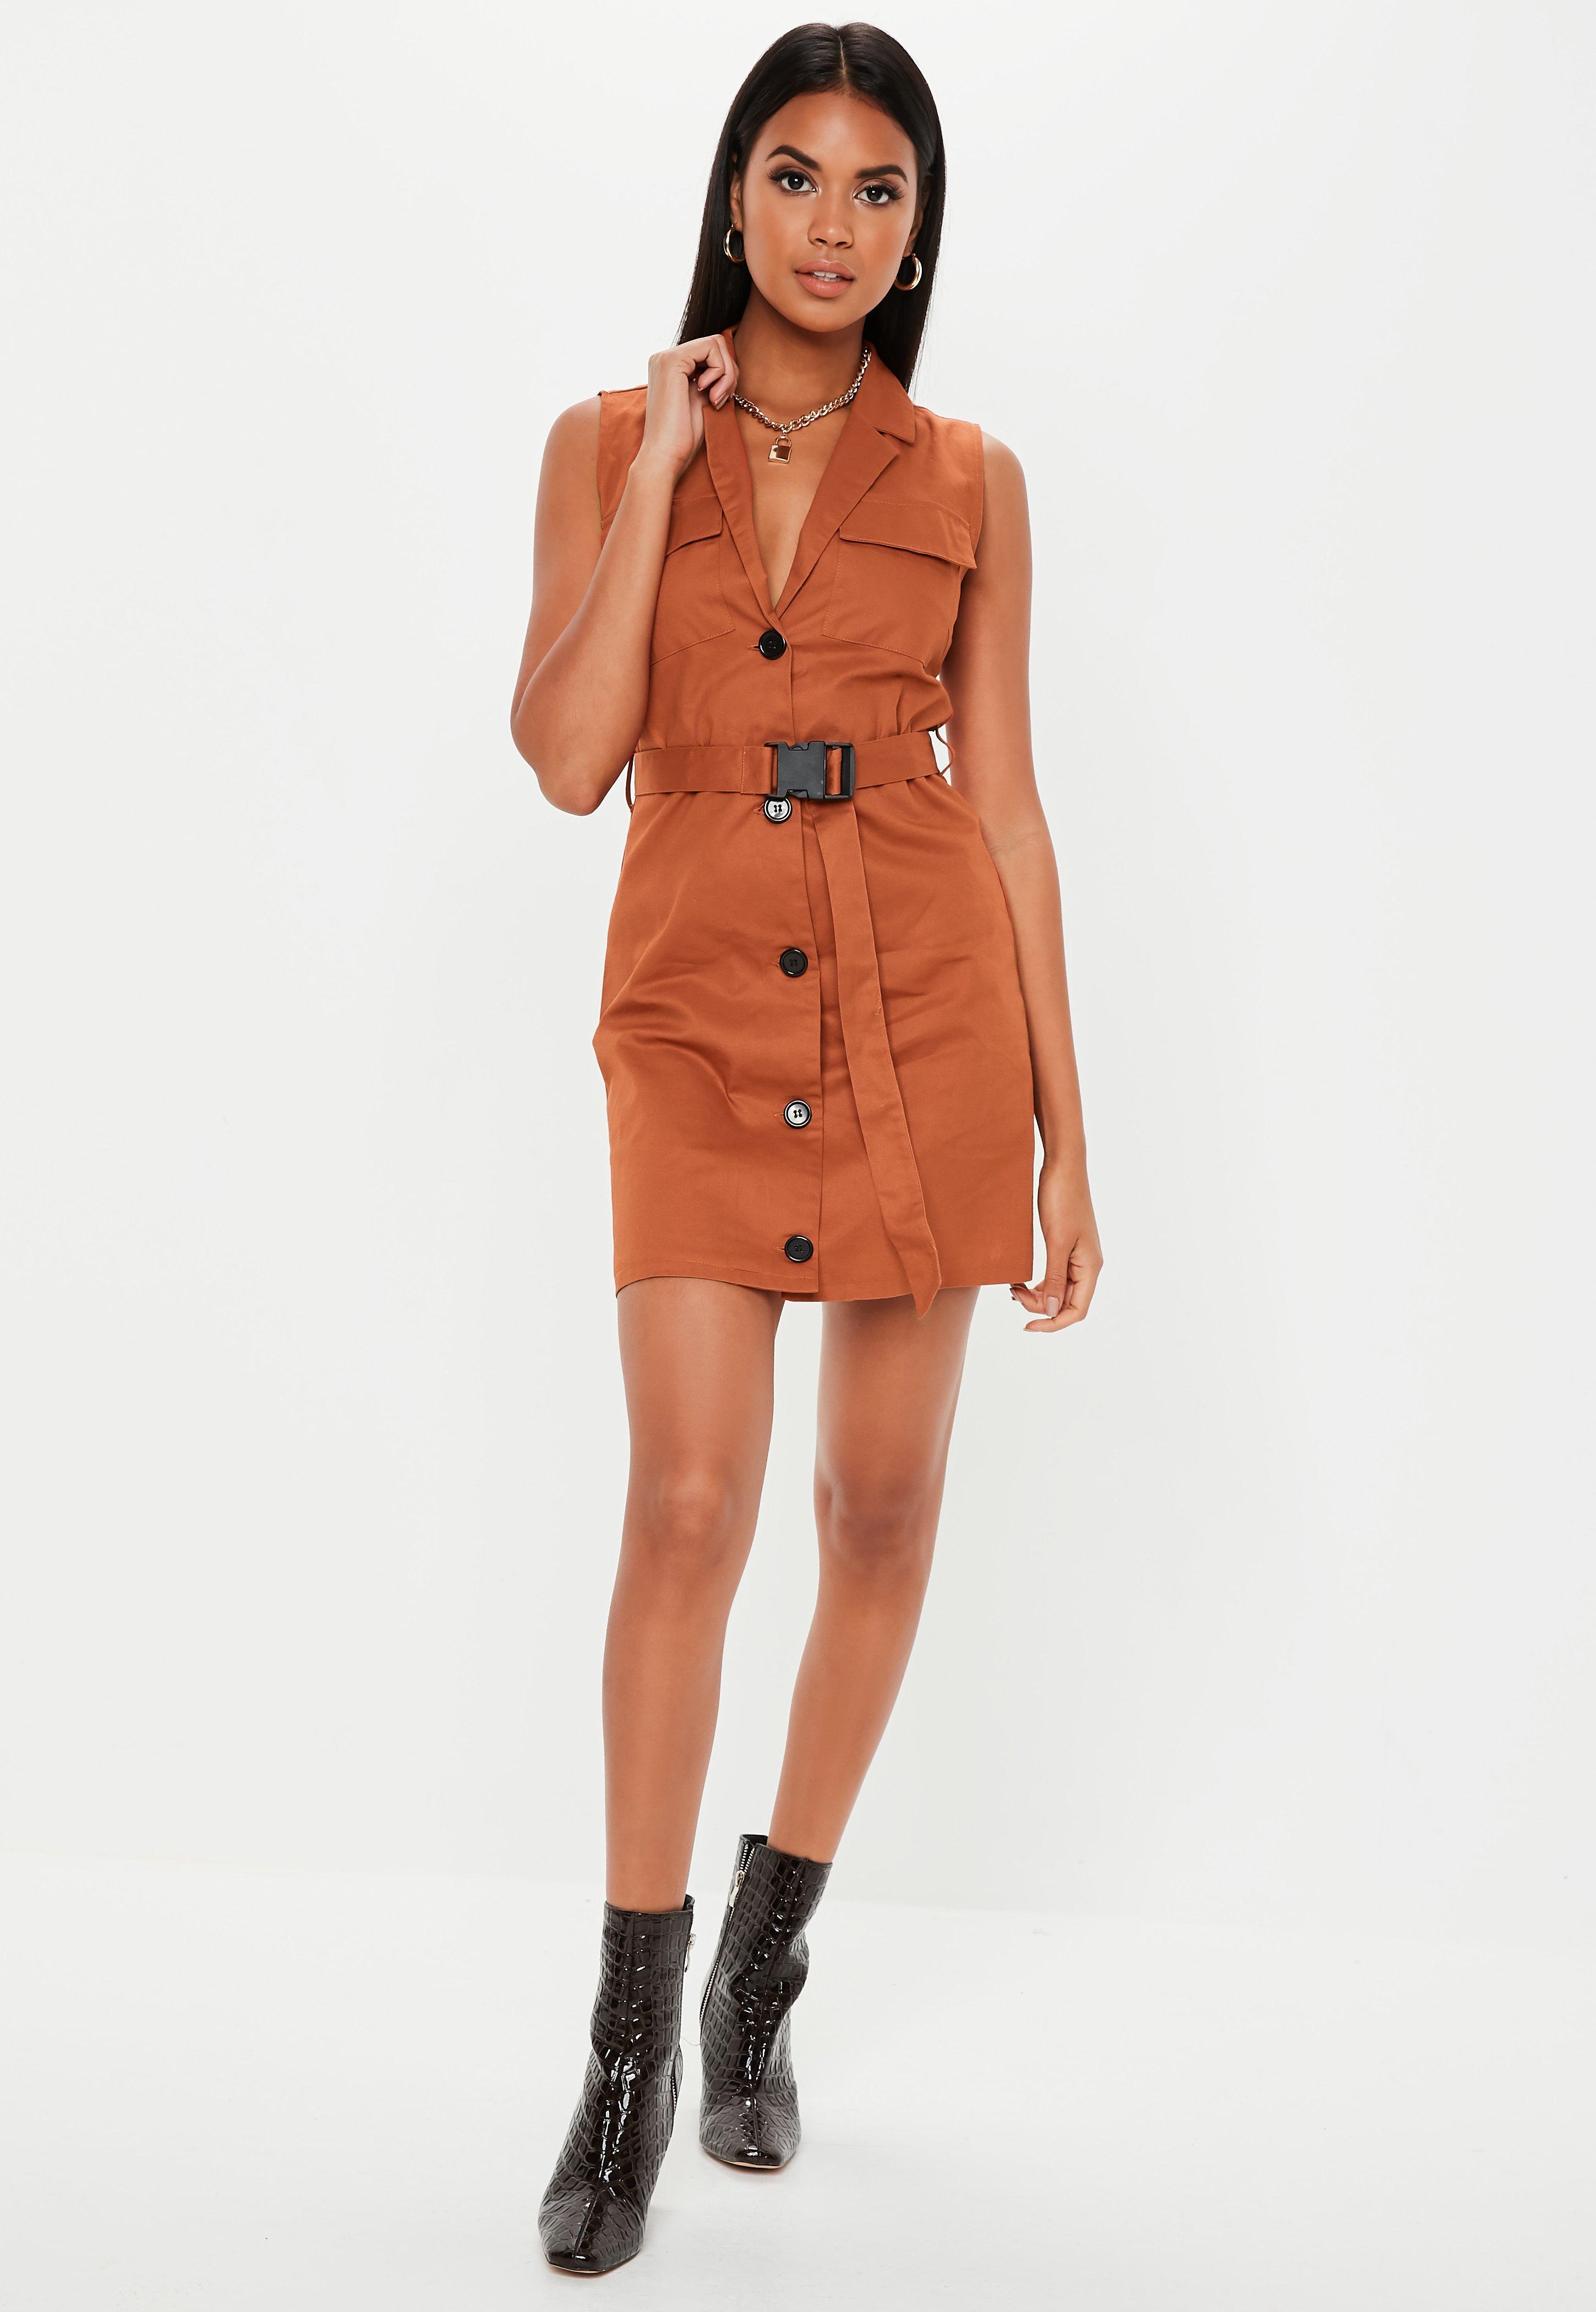 dae168beb8df76 Lyst - Missguided Rust Sleeveless Belted Blazer Dress in Orange